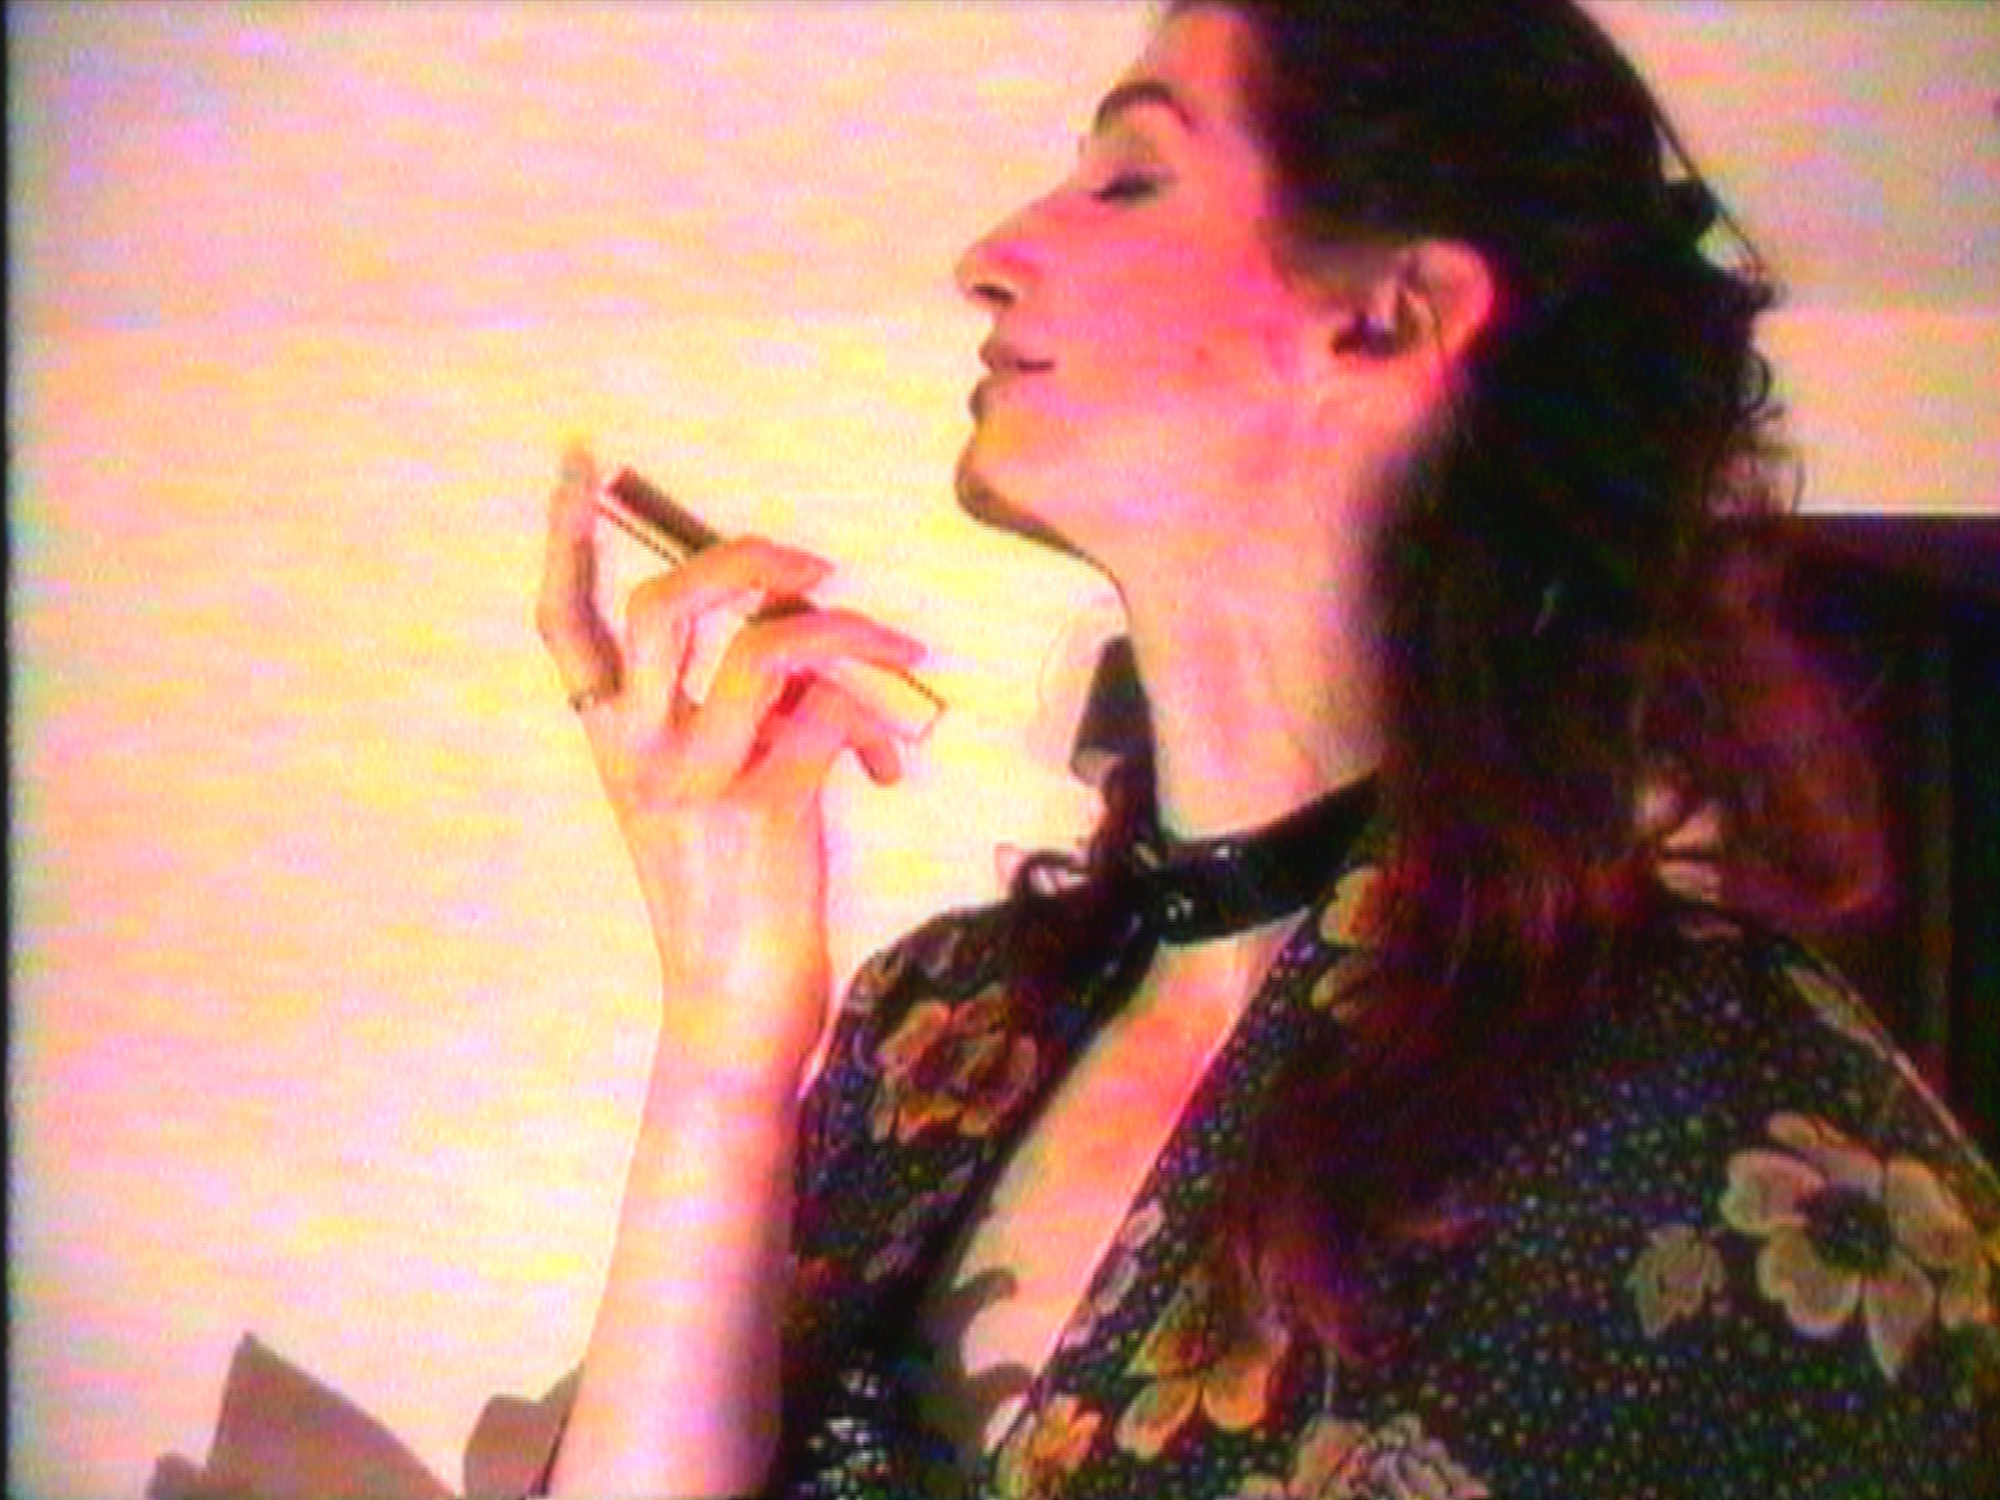 Geena Matuson  (@geenamatuson) and Dawn Nightshade directed by John Hartman of  Reel Groovy Films  on the set of his fake commercial shoot, 2016.